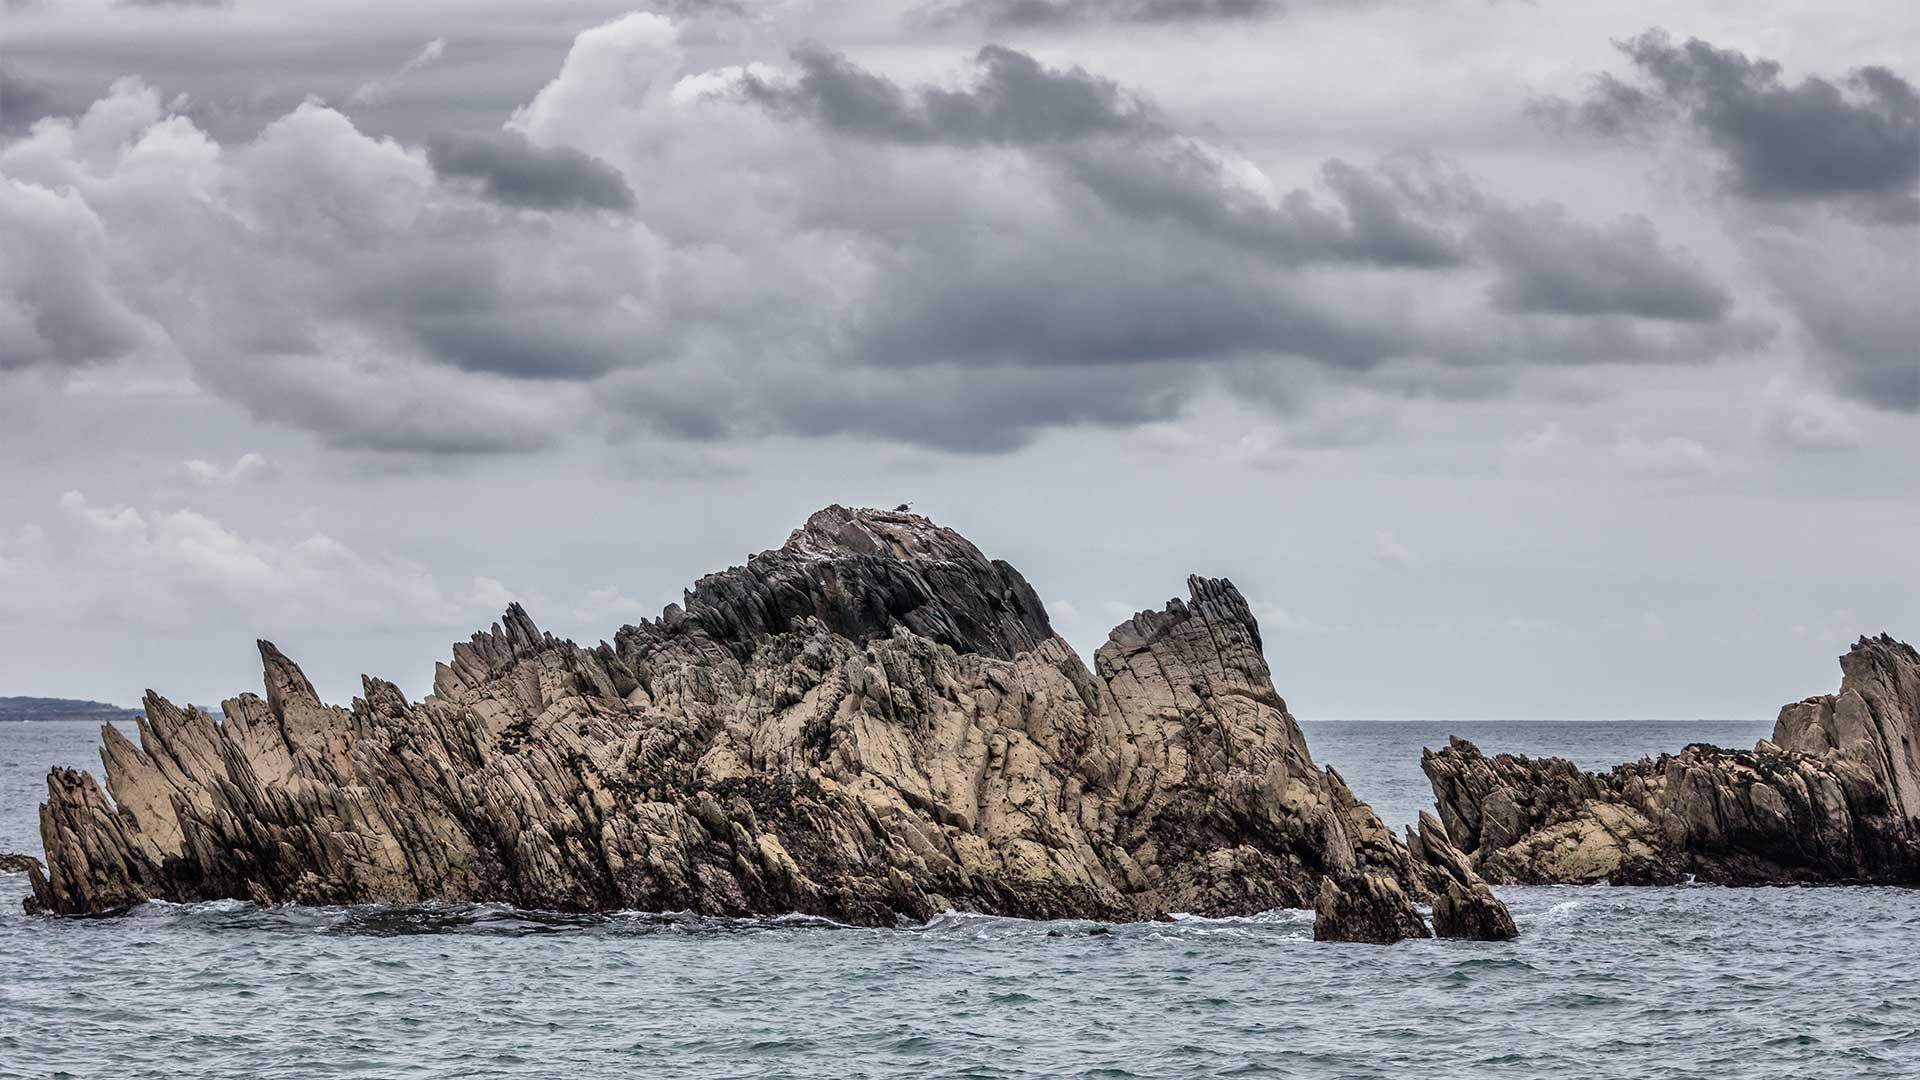 Landschaftsfotografie: Tour zu den Les Sept Iles | Foto: Dieter Eikenberg, imprints